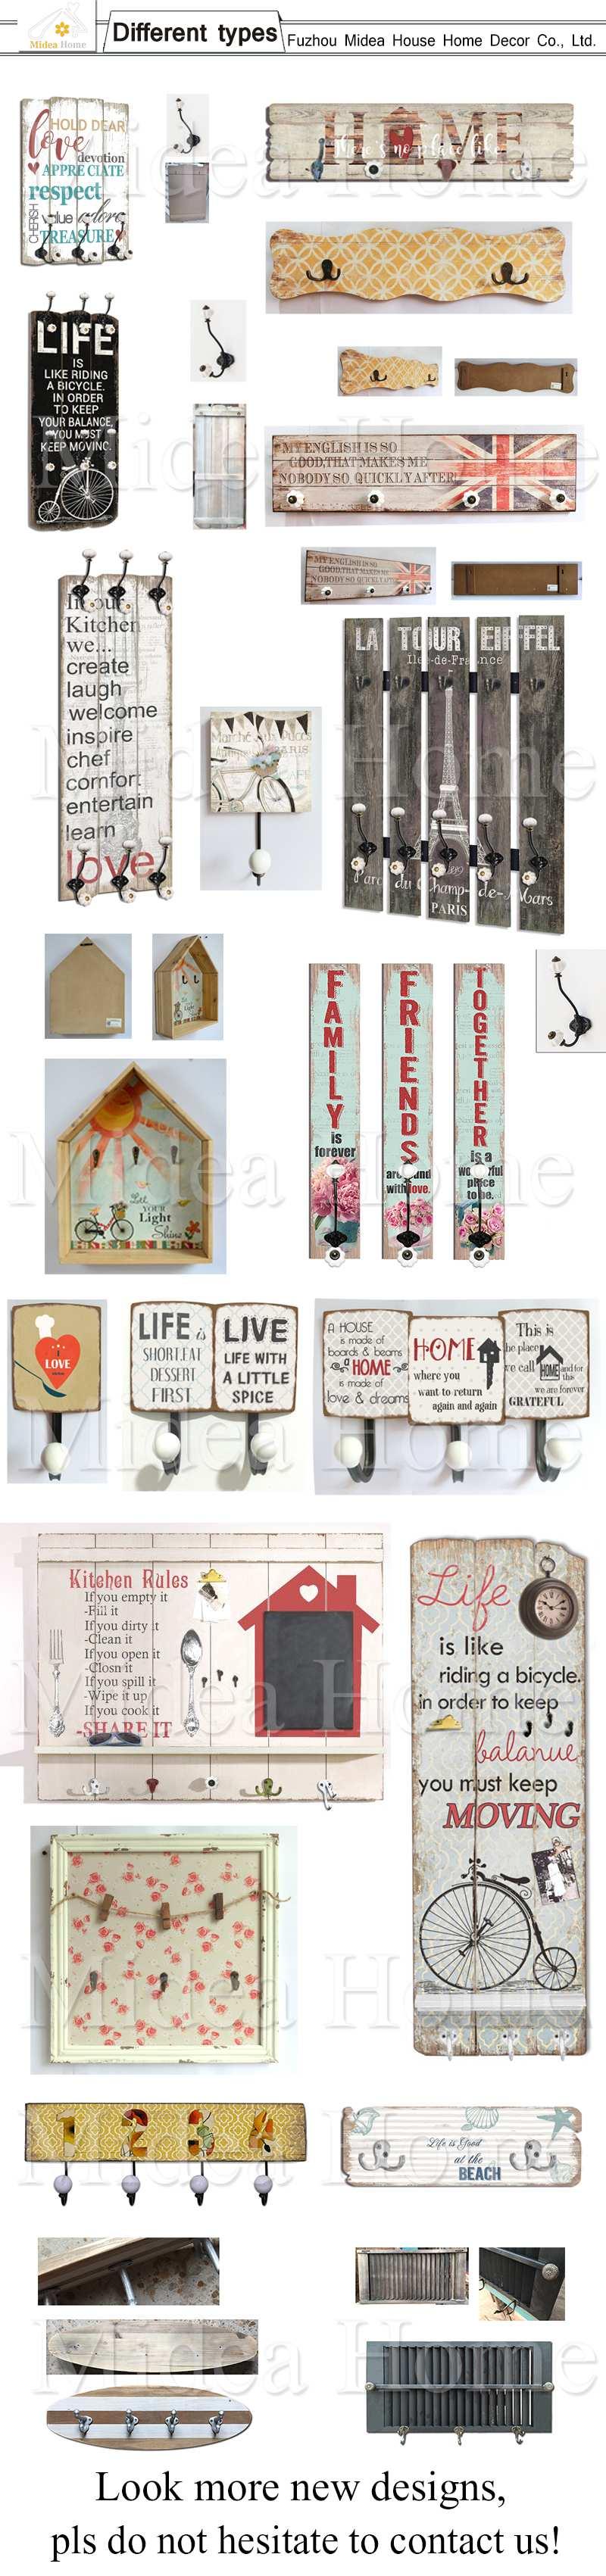 Distressed Hanging Wooden Key Rack